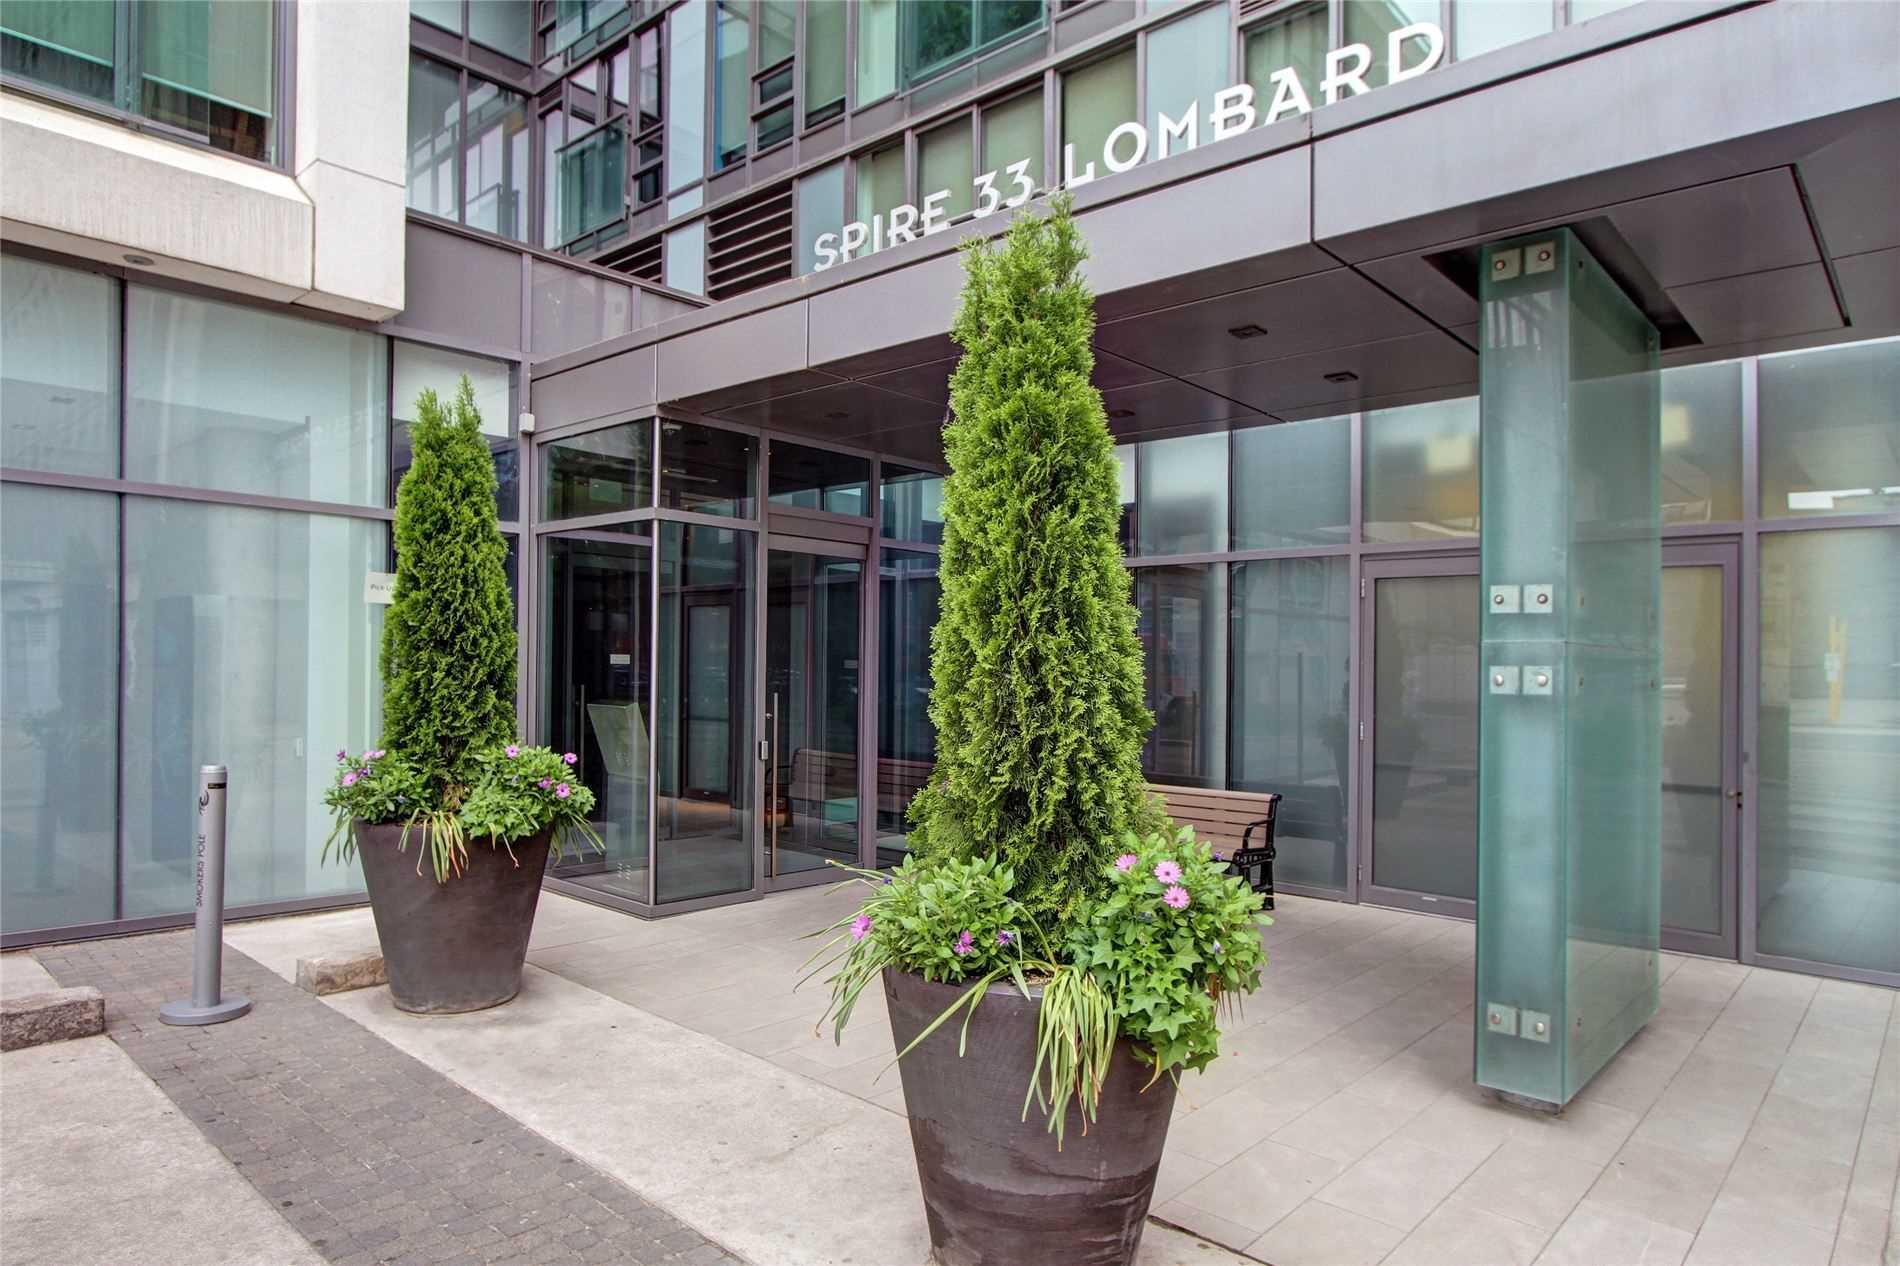 33 Lombard St, Toronto Ontario, Canada